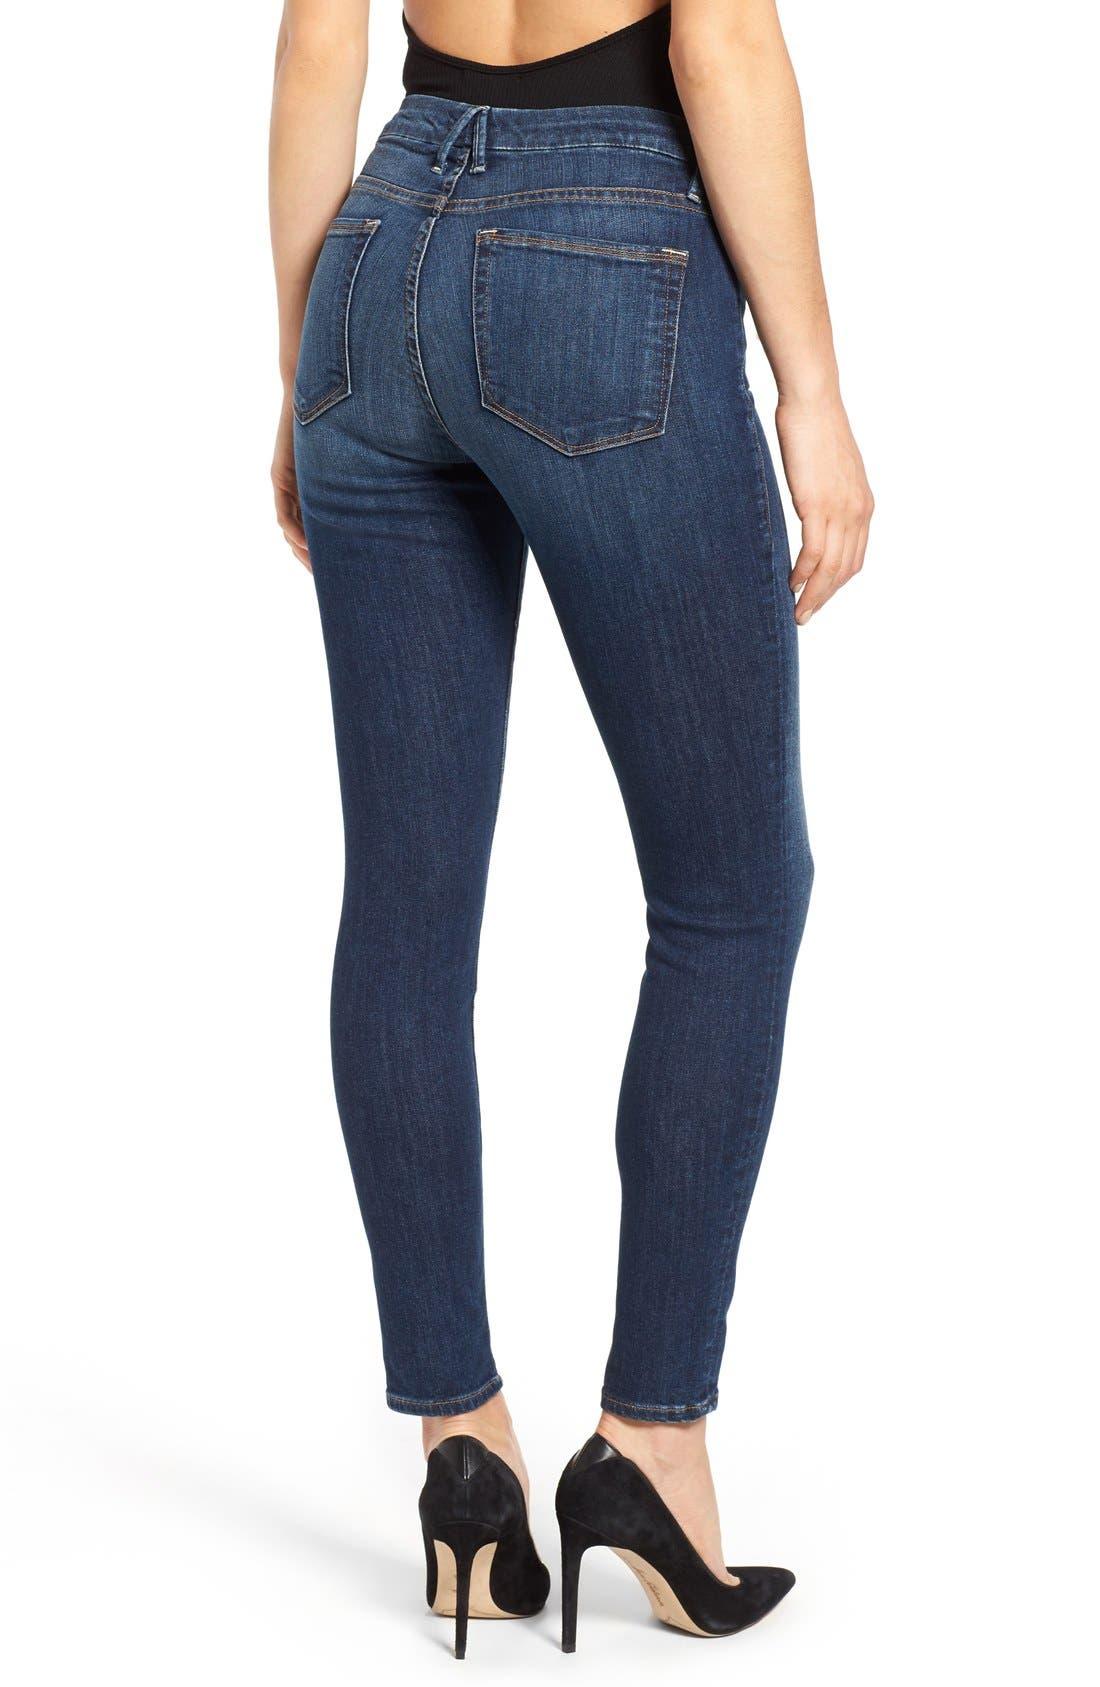 Alternate Image 2  - Good American Good Legs High Rise Skinny Jeans (Blue 004)